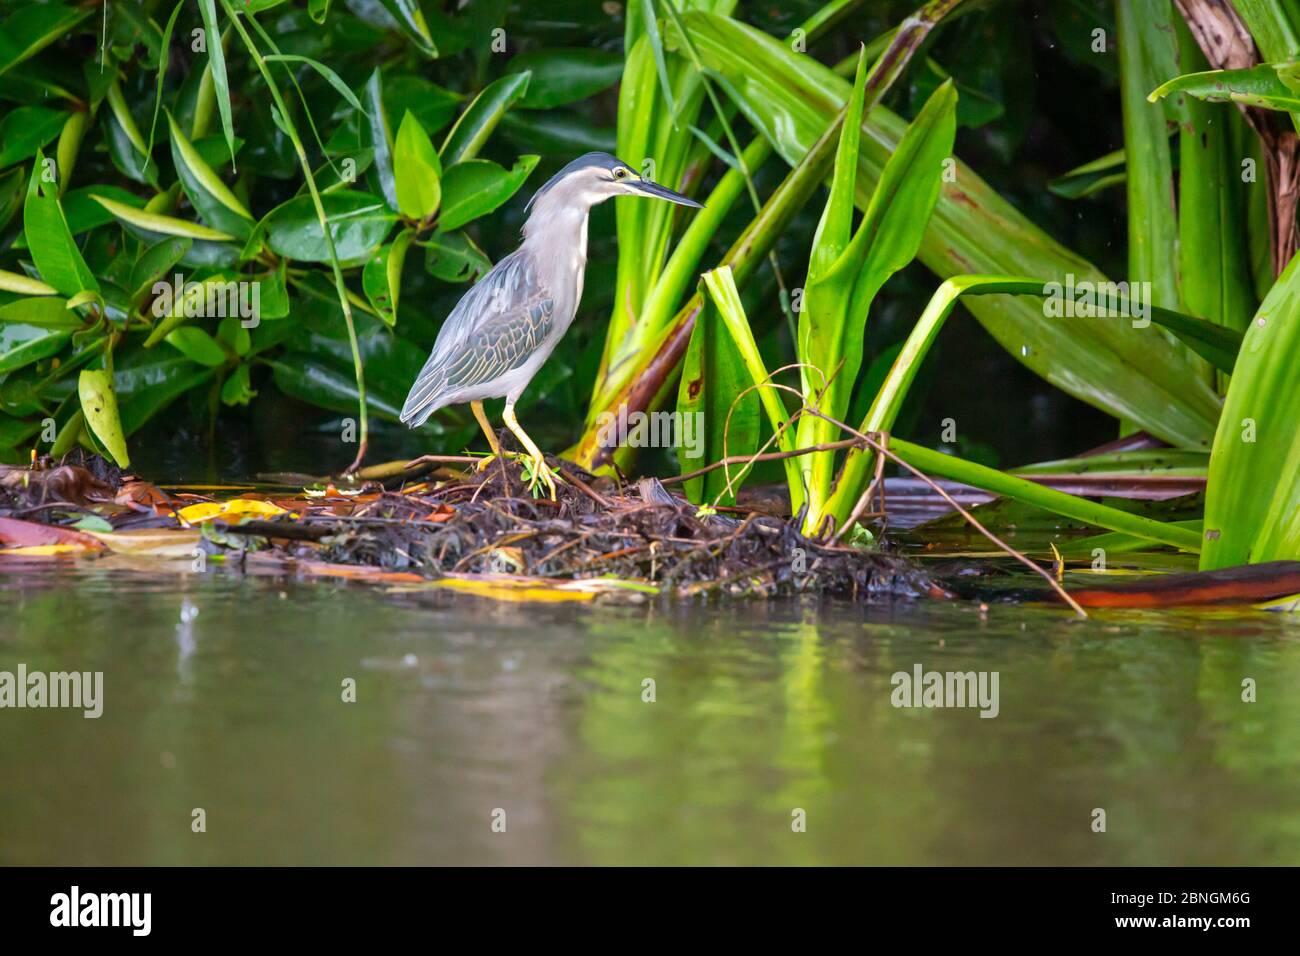 Rheier im Schilf am Fluss auf Sri Lanka Stock Photo